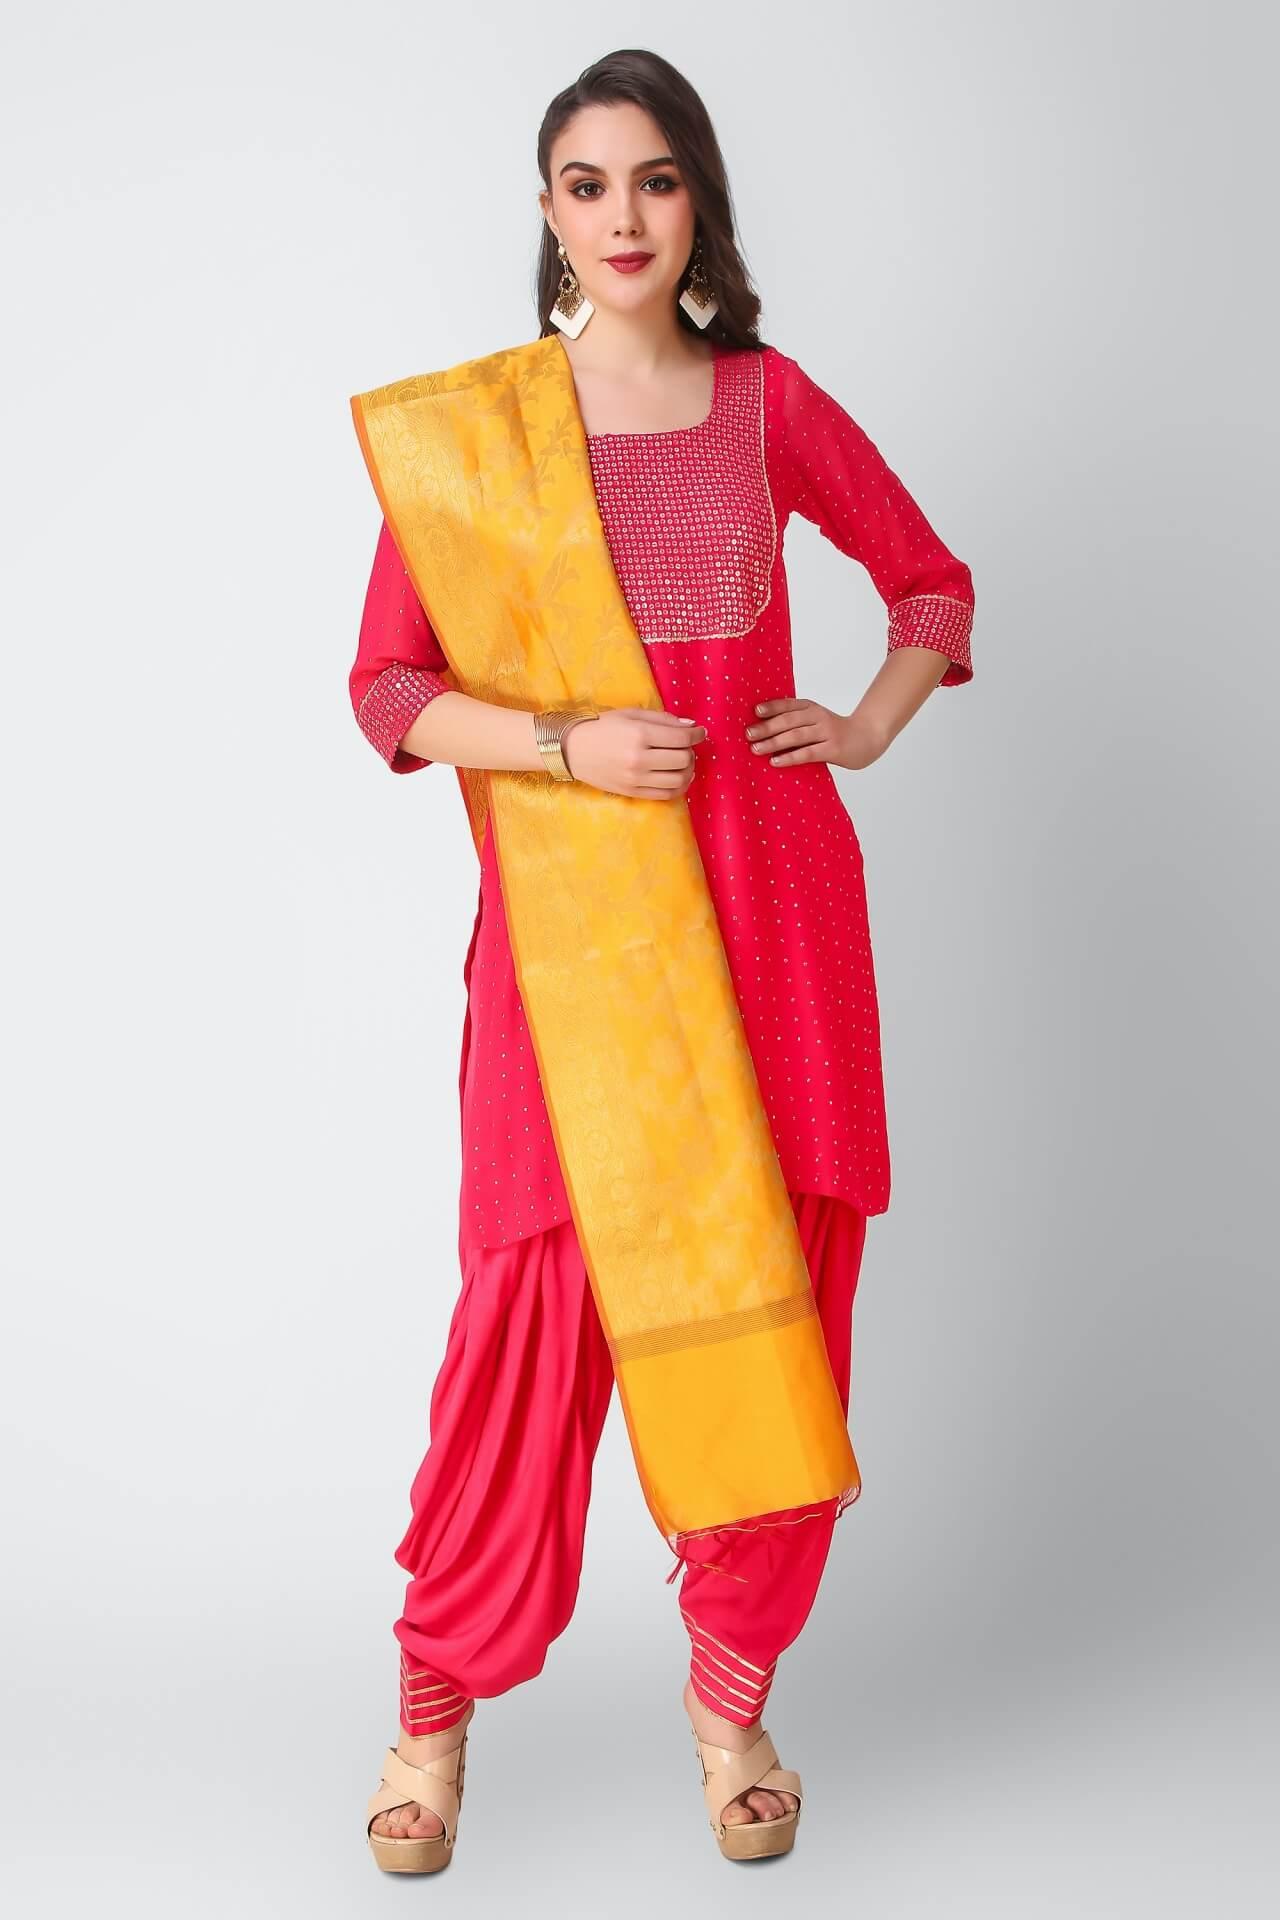 Fushia Patiala Suit With Mustard Banarsi Dupatta